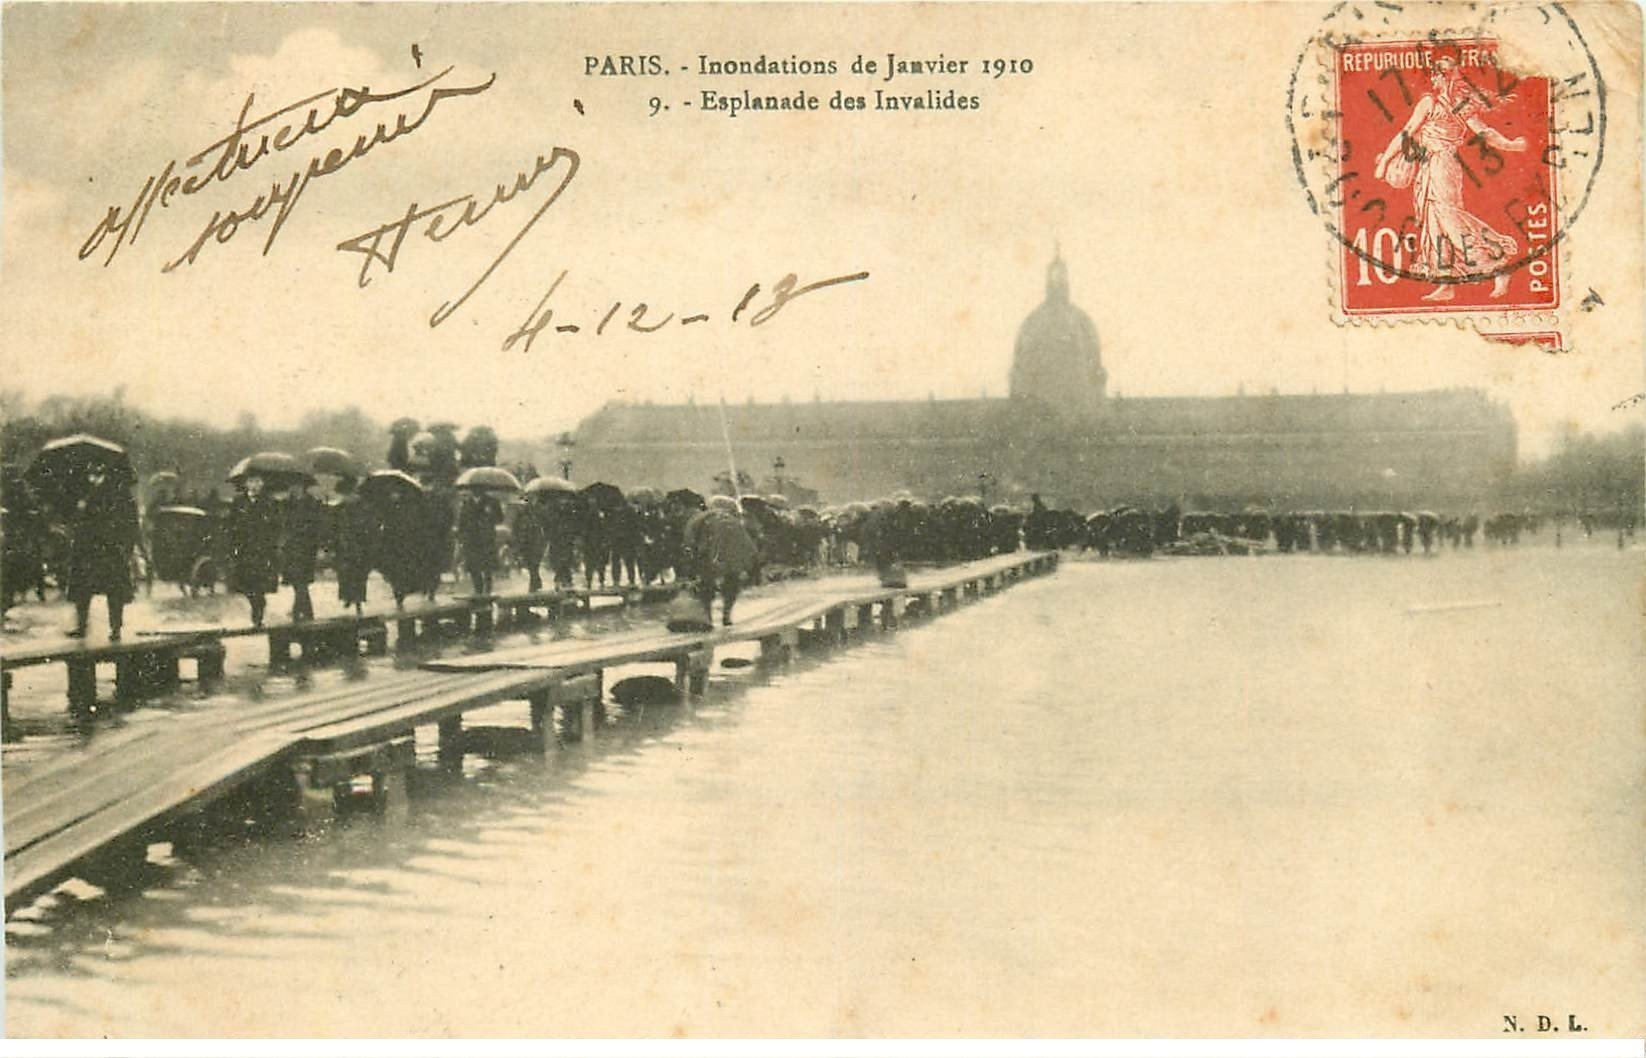 carte postale ancienne INONDATION ET CRUE PARIS 1910. Esplanade Invalides 1913